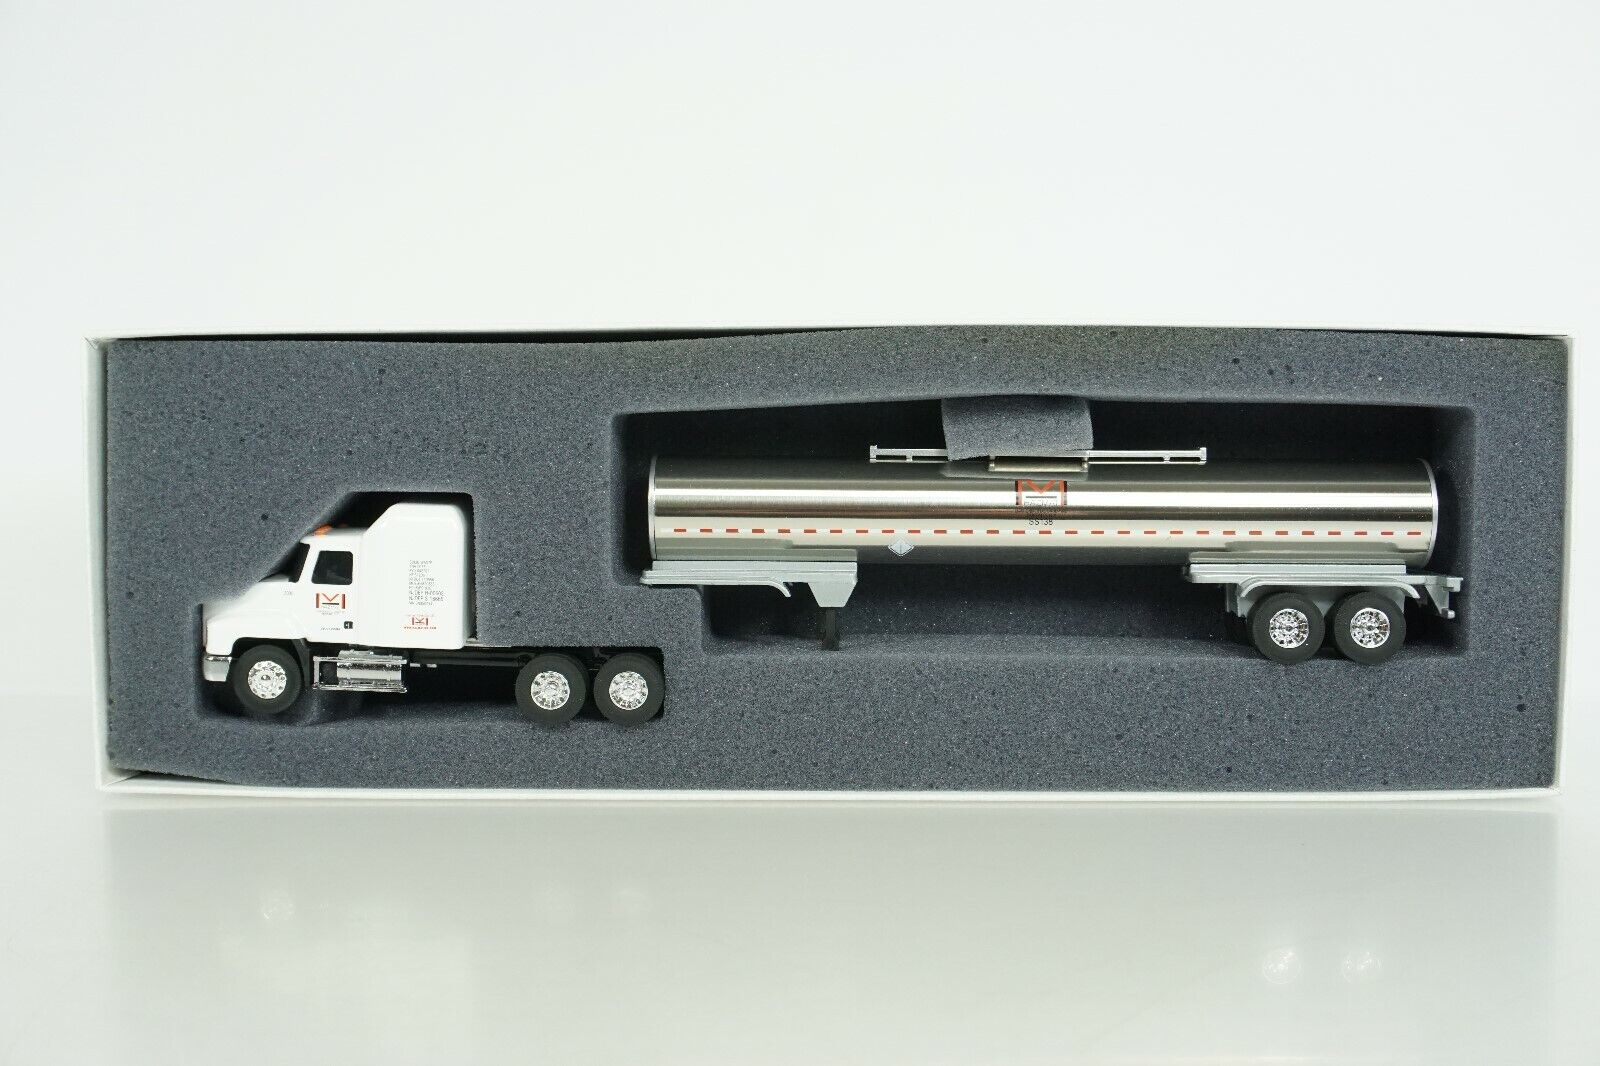 Penjoy 1 64 Die Cast Hazmat Tractor w  Tanker Trailer Buffalo, NY Nice Box NEW